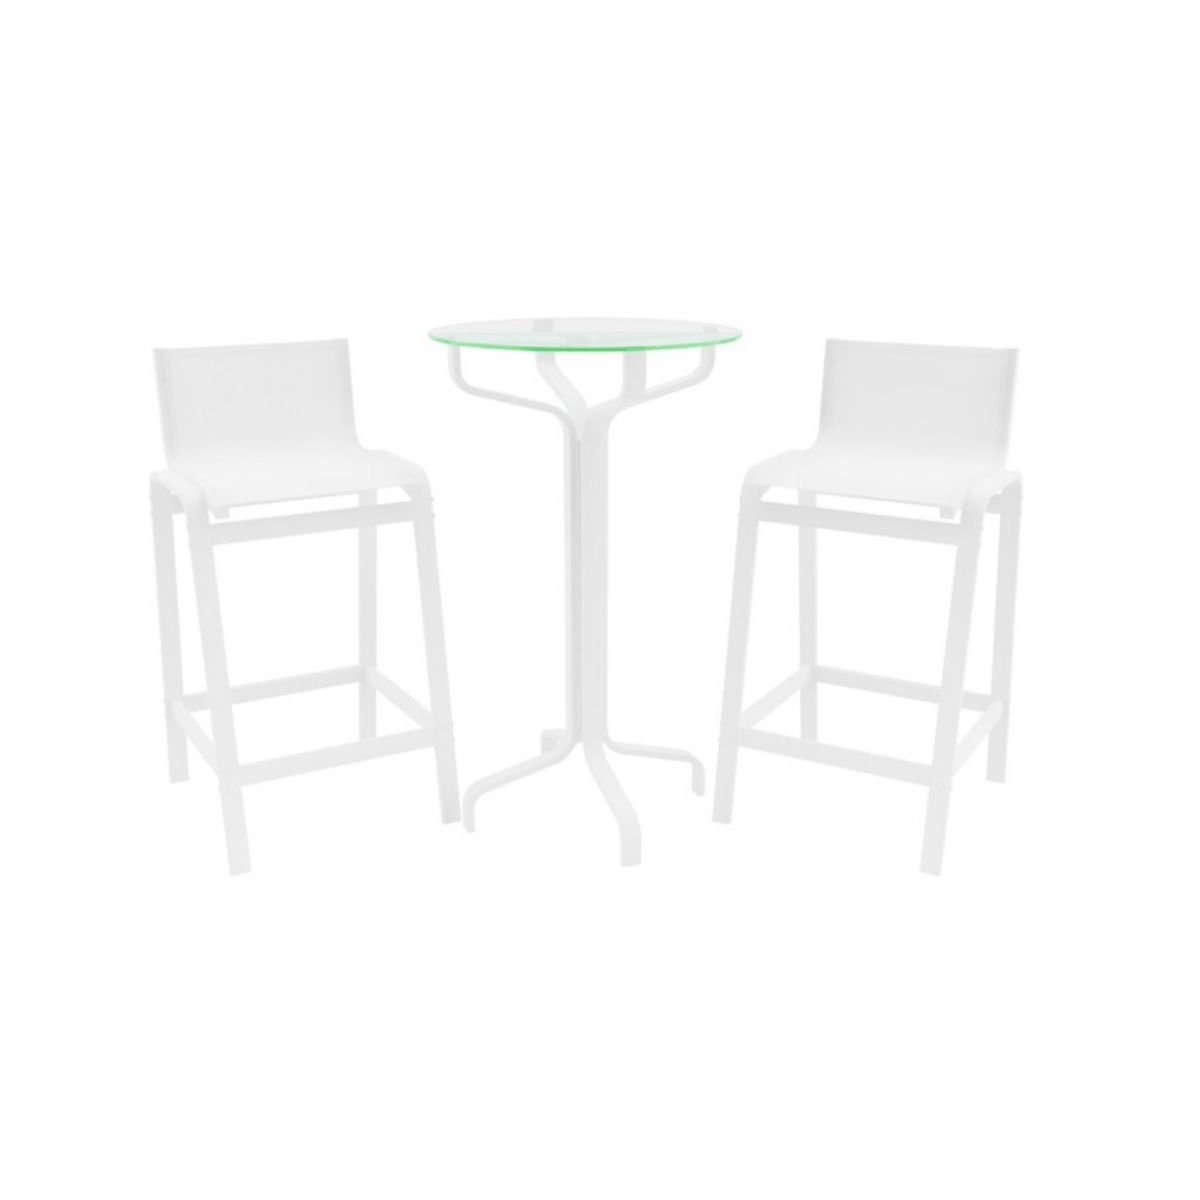 Conjunto com 2 Banquetas Altas de Alumínio Cozinha, Sala, Sala de Jantar, Bar, Jardim